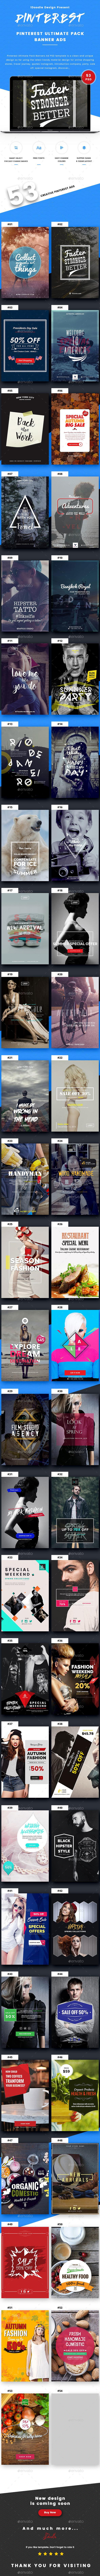 Pinterest Pack Banners Ads - 53 PSD - Social Media Web Elements